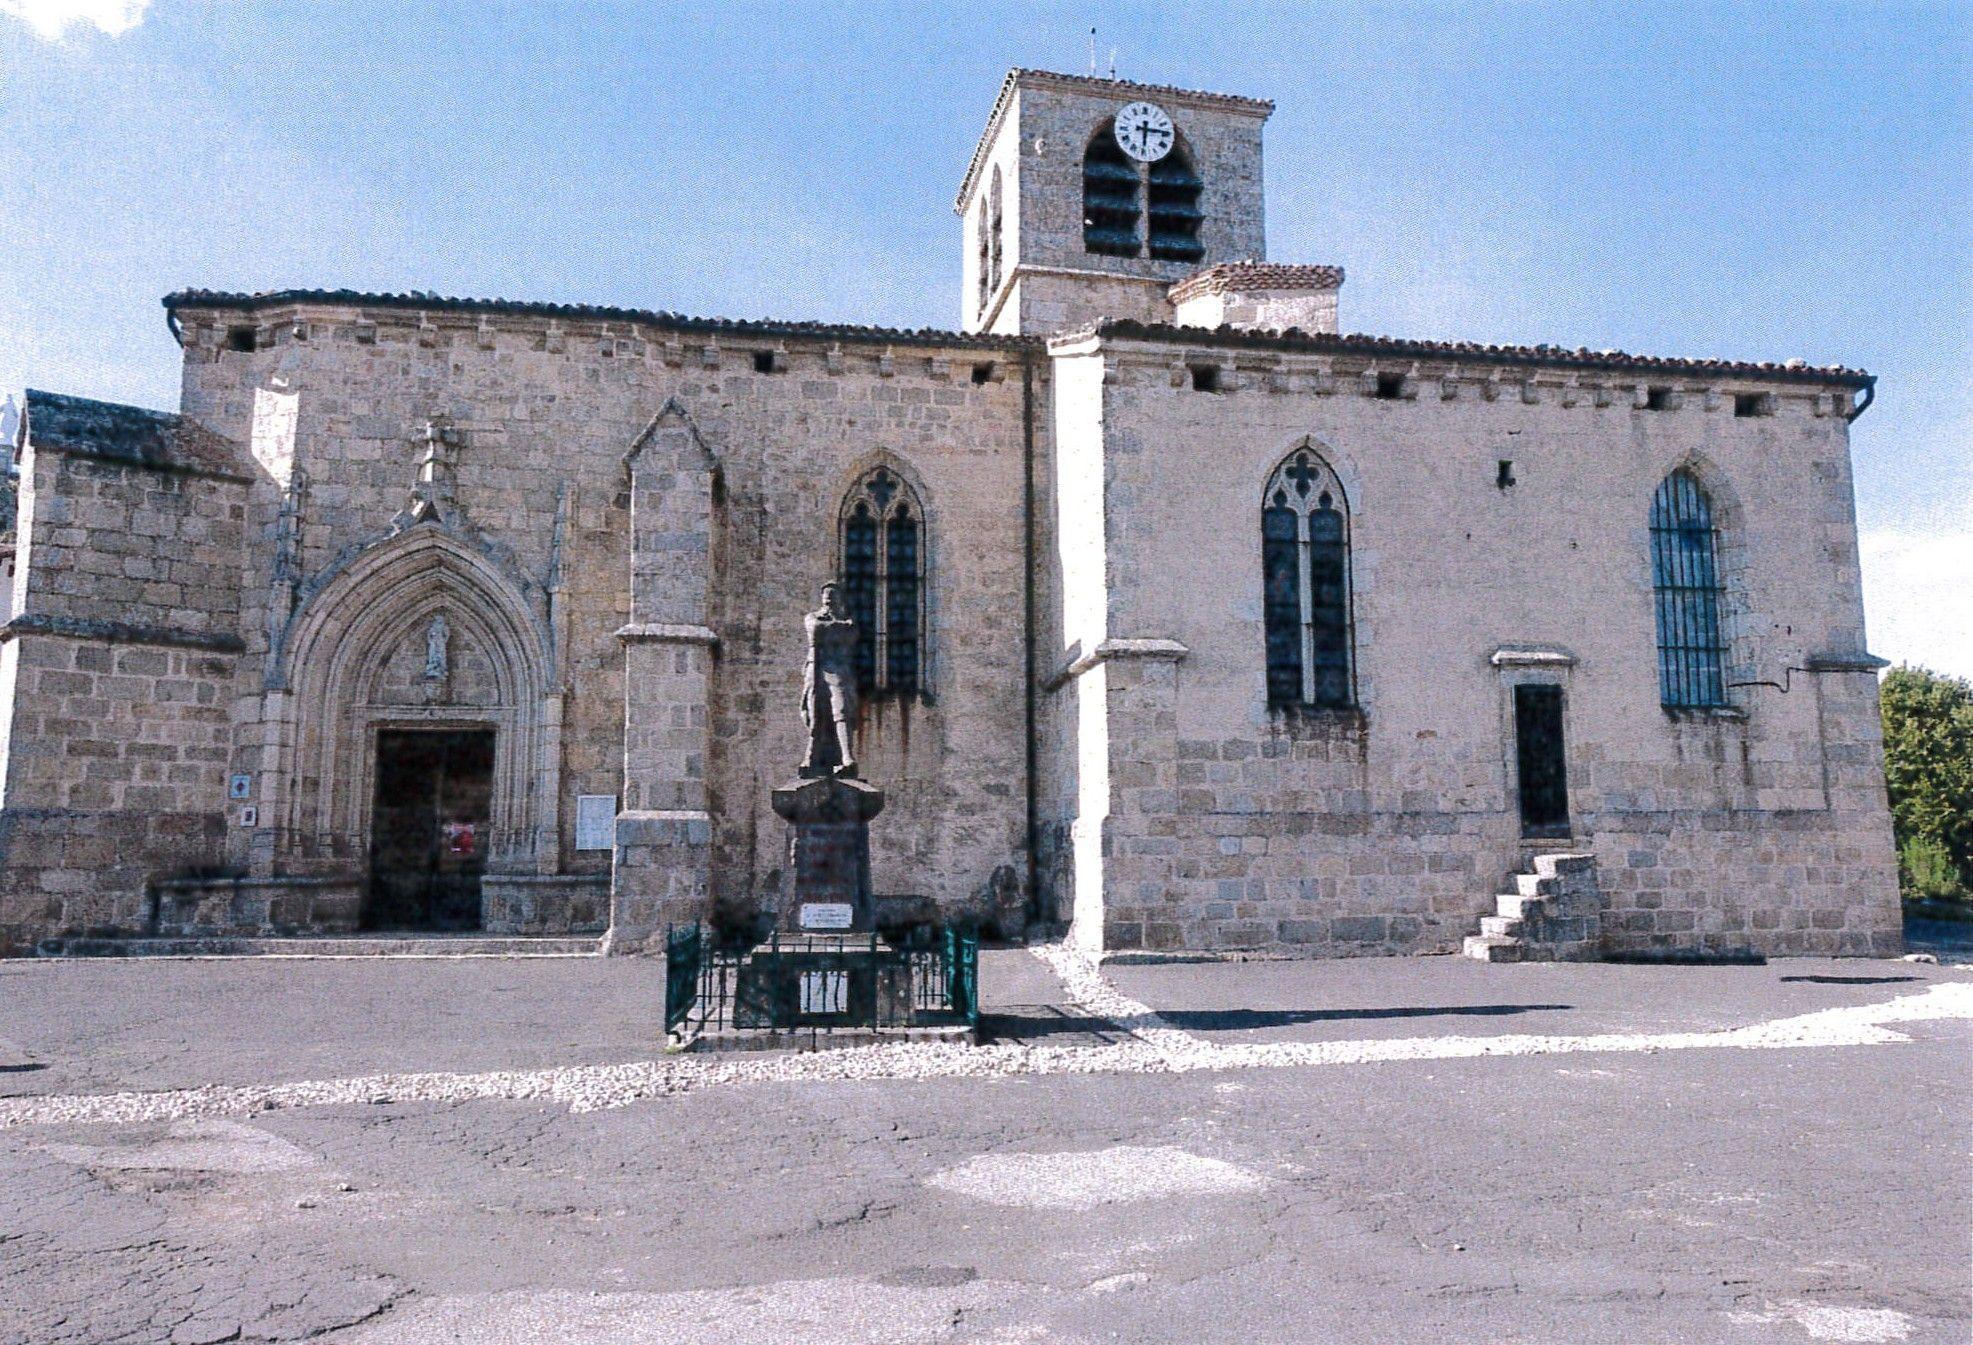 Eglise Saint-Antoine du Monestier